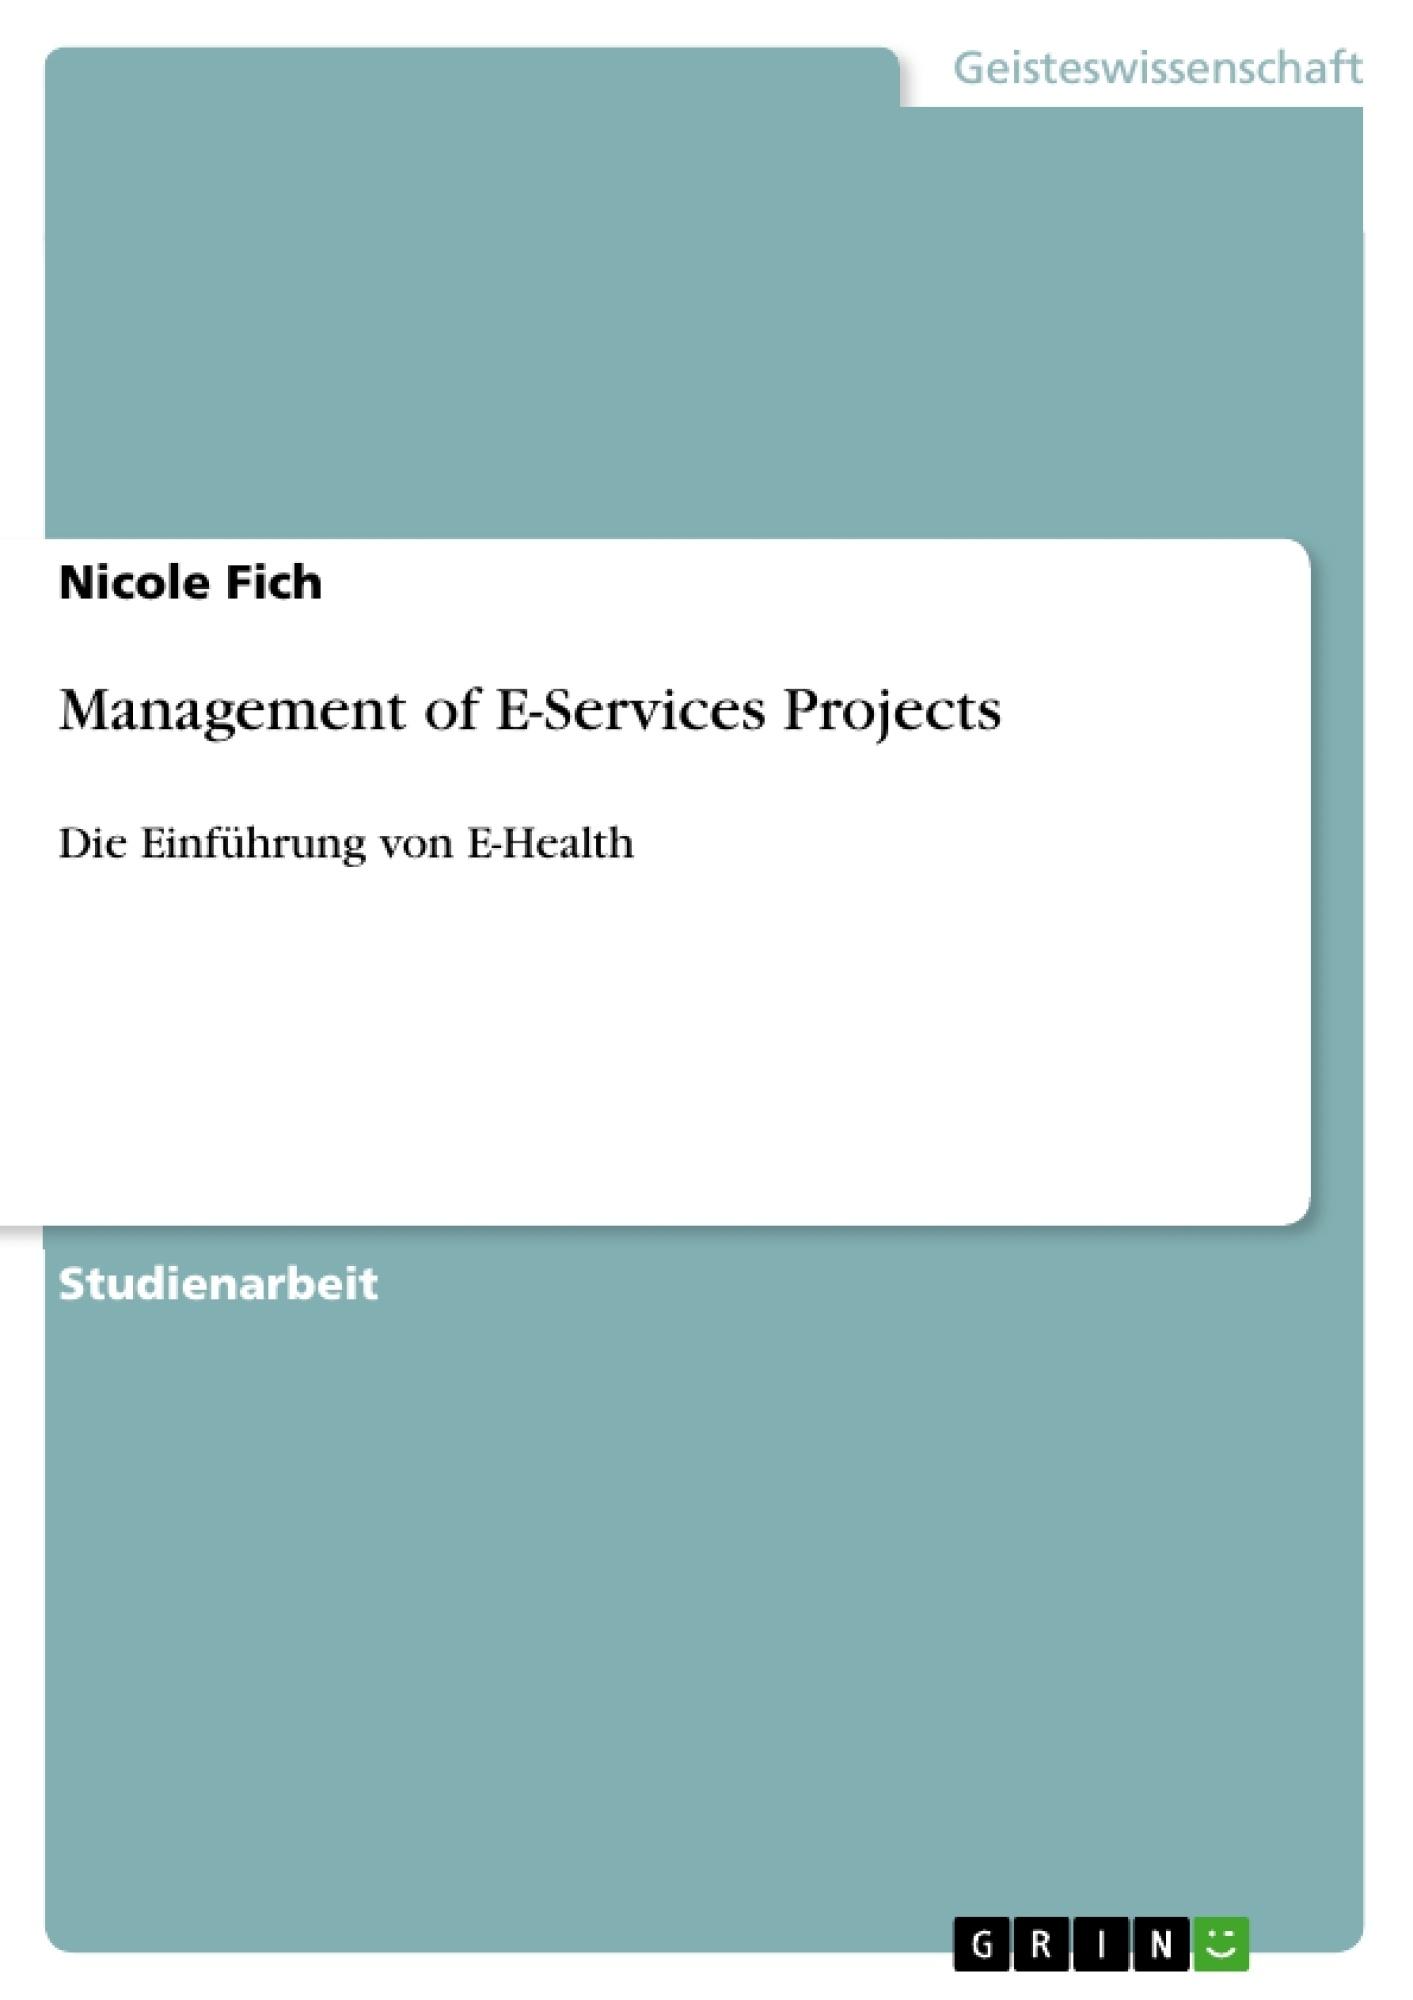 Titel: Management of E-Services Projects